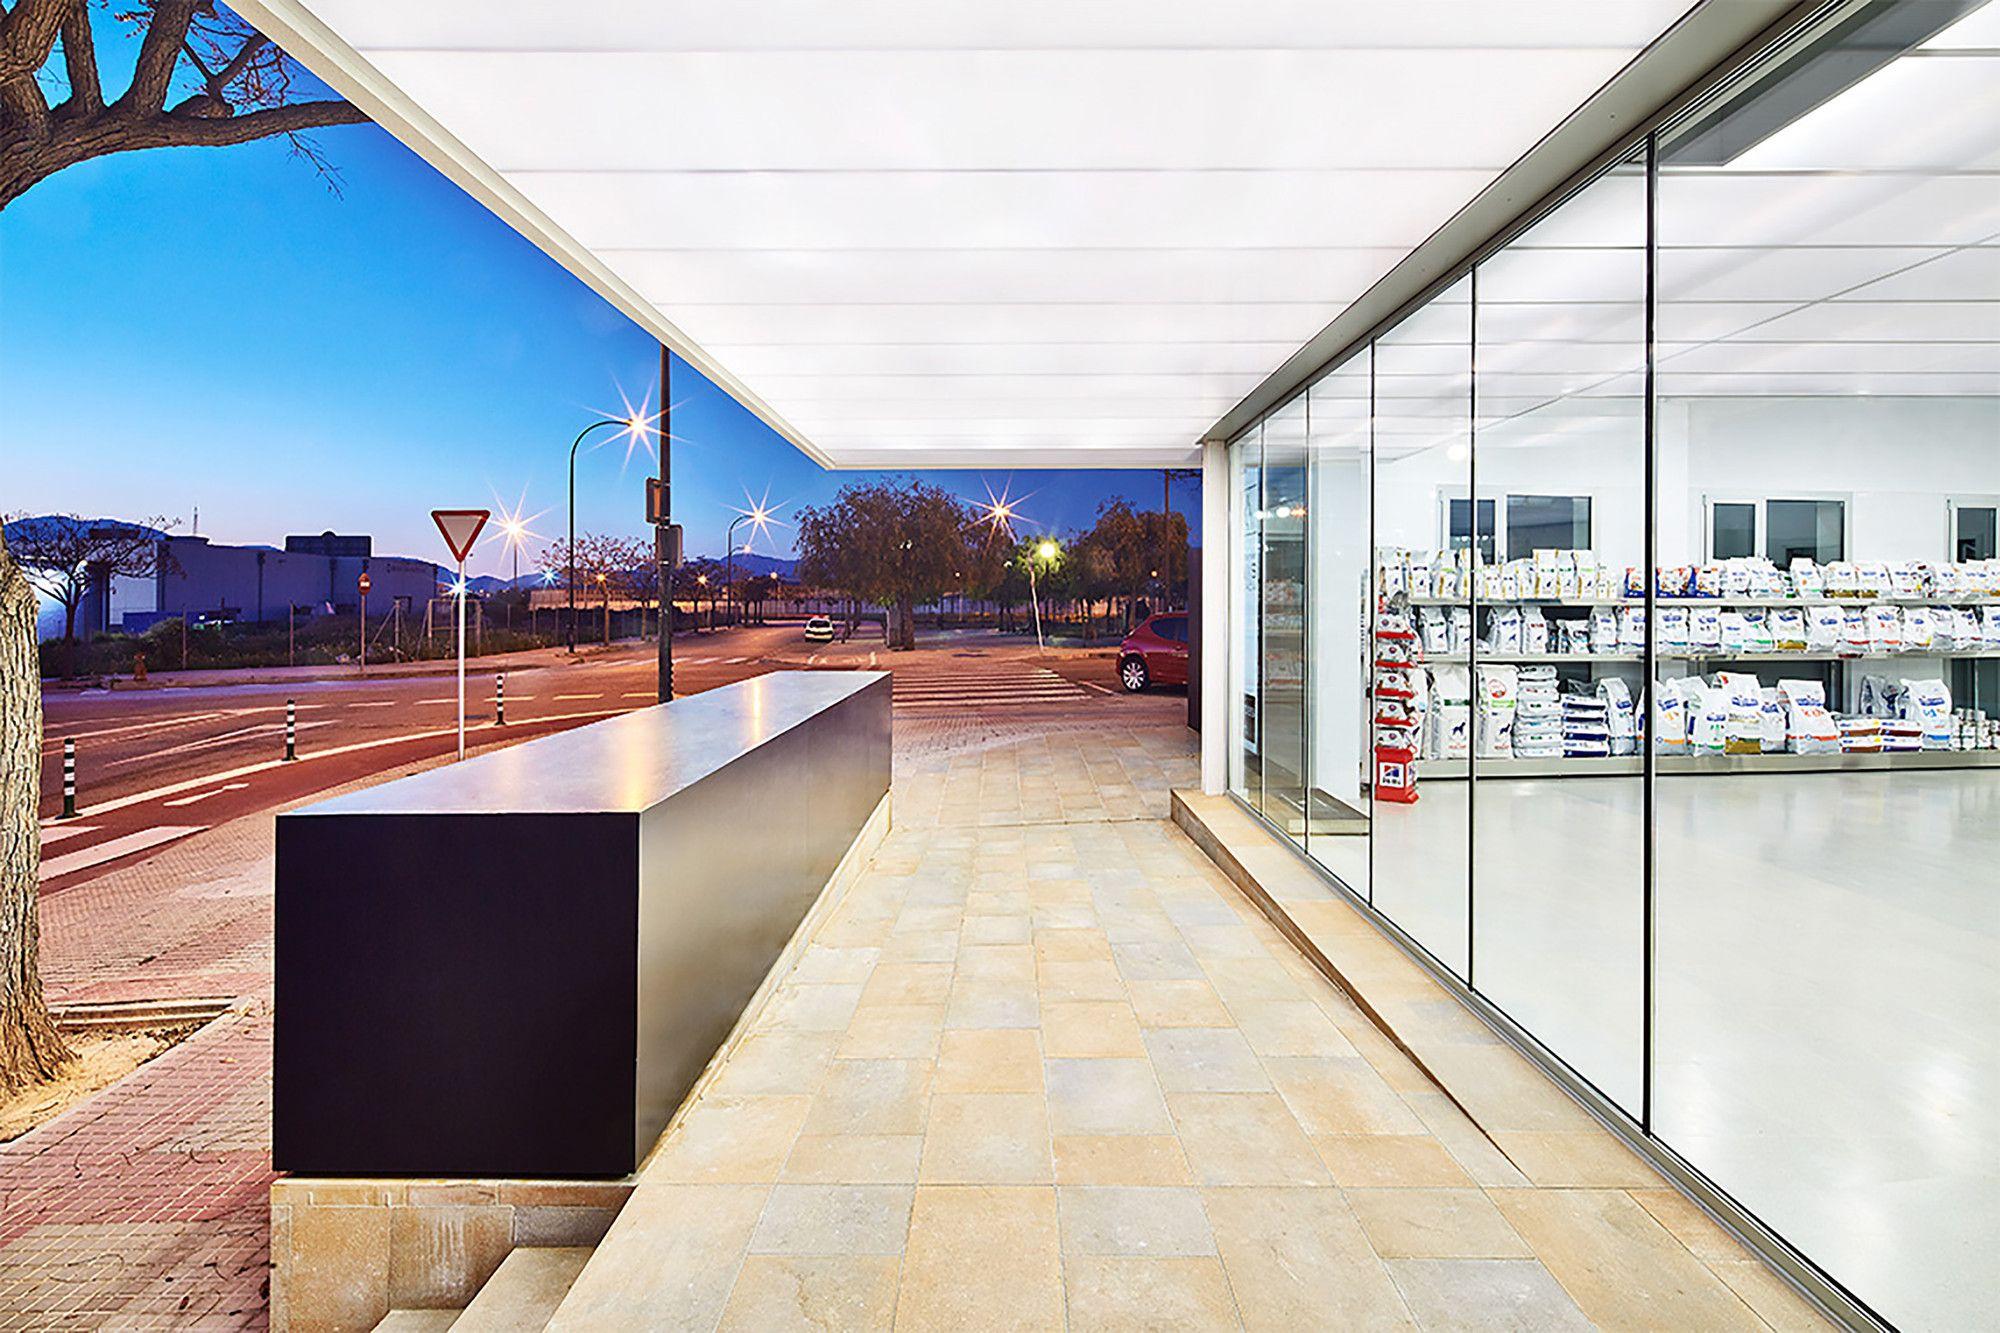 Gallery of Veterinary Hospital Canis Mallorca / Estudi E